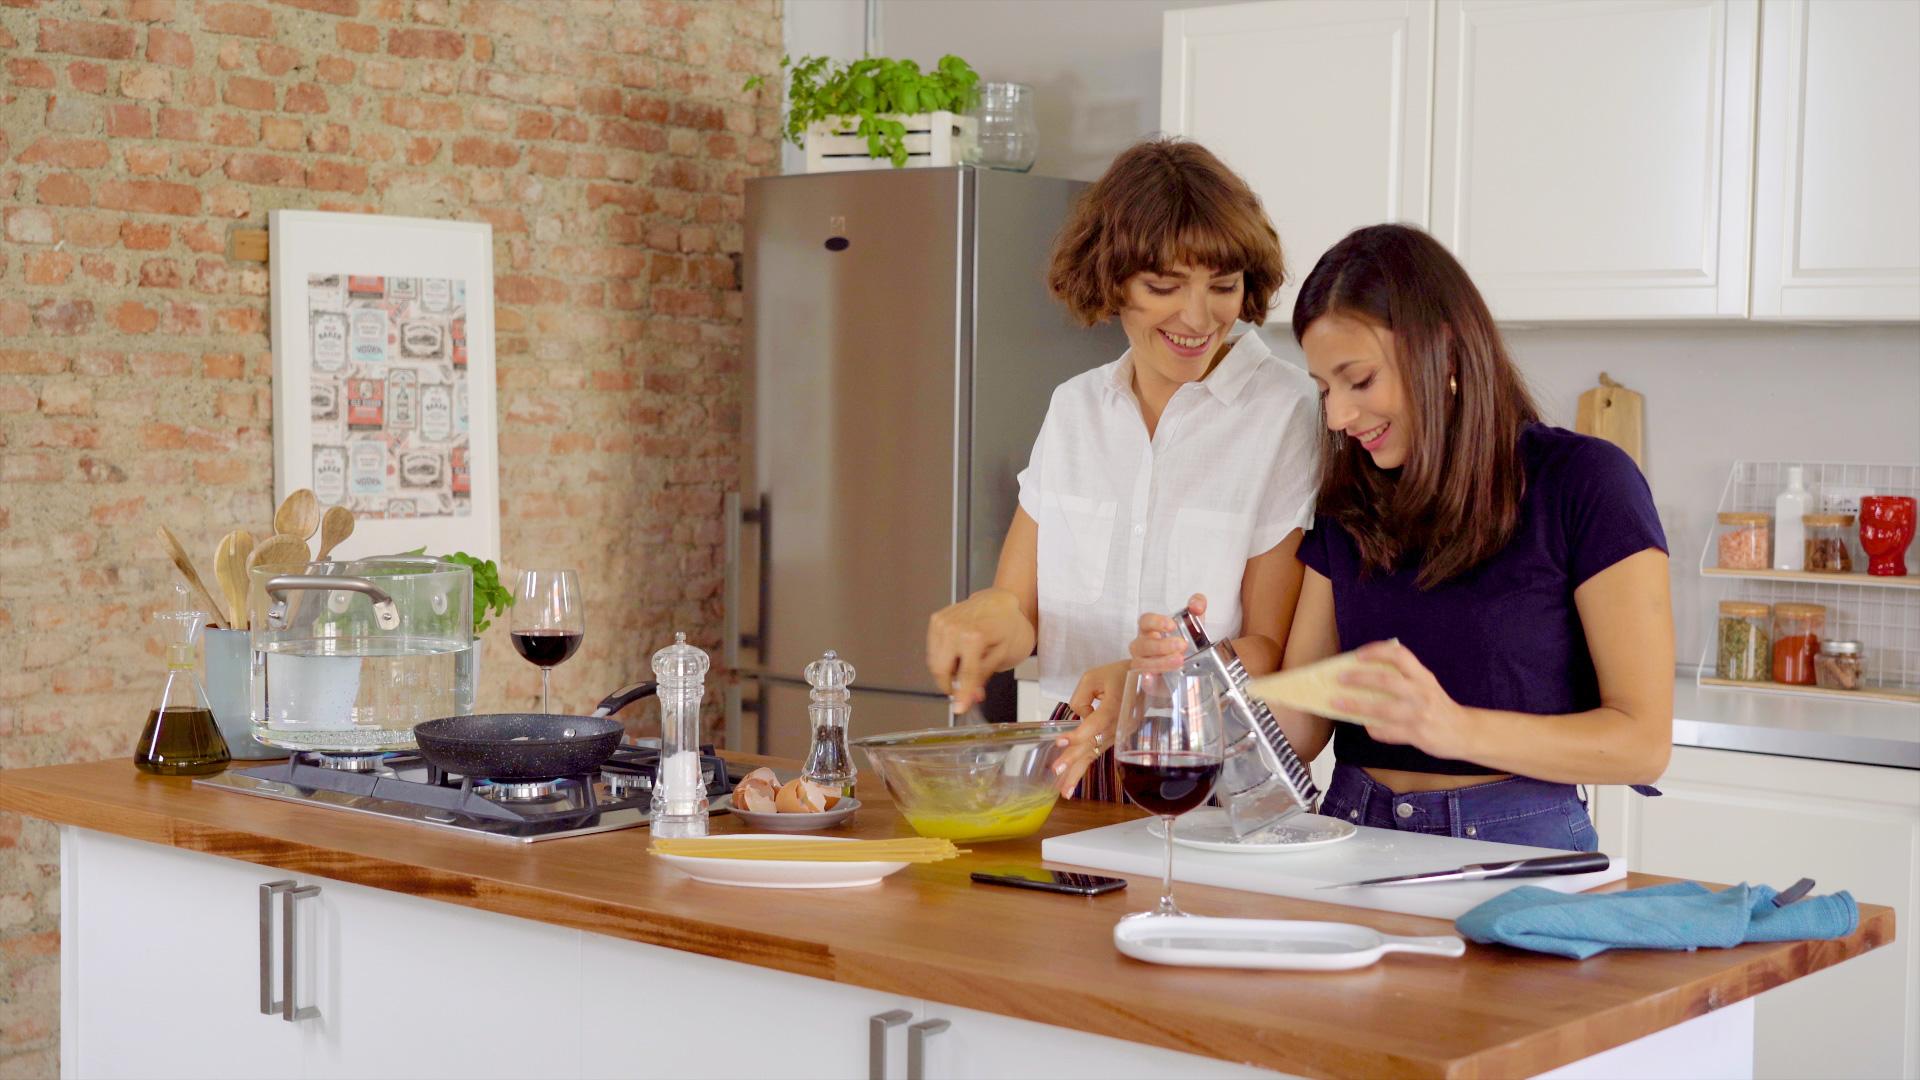 La Cucina Italiana Benvenuto